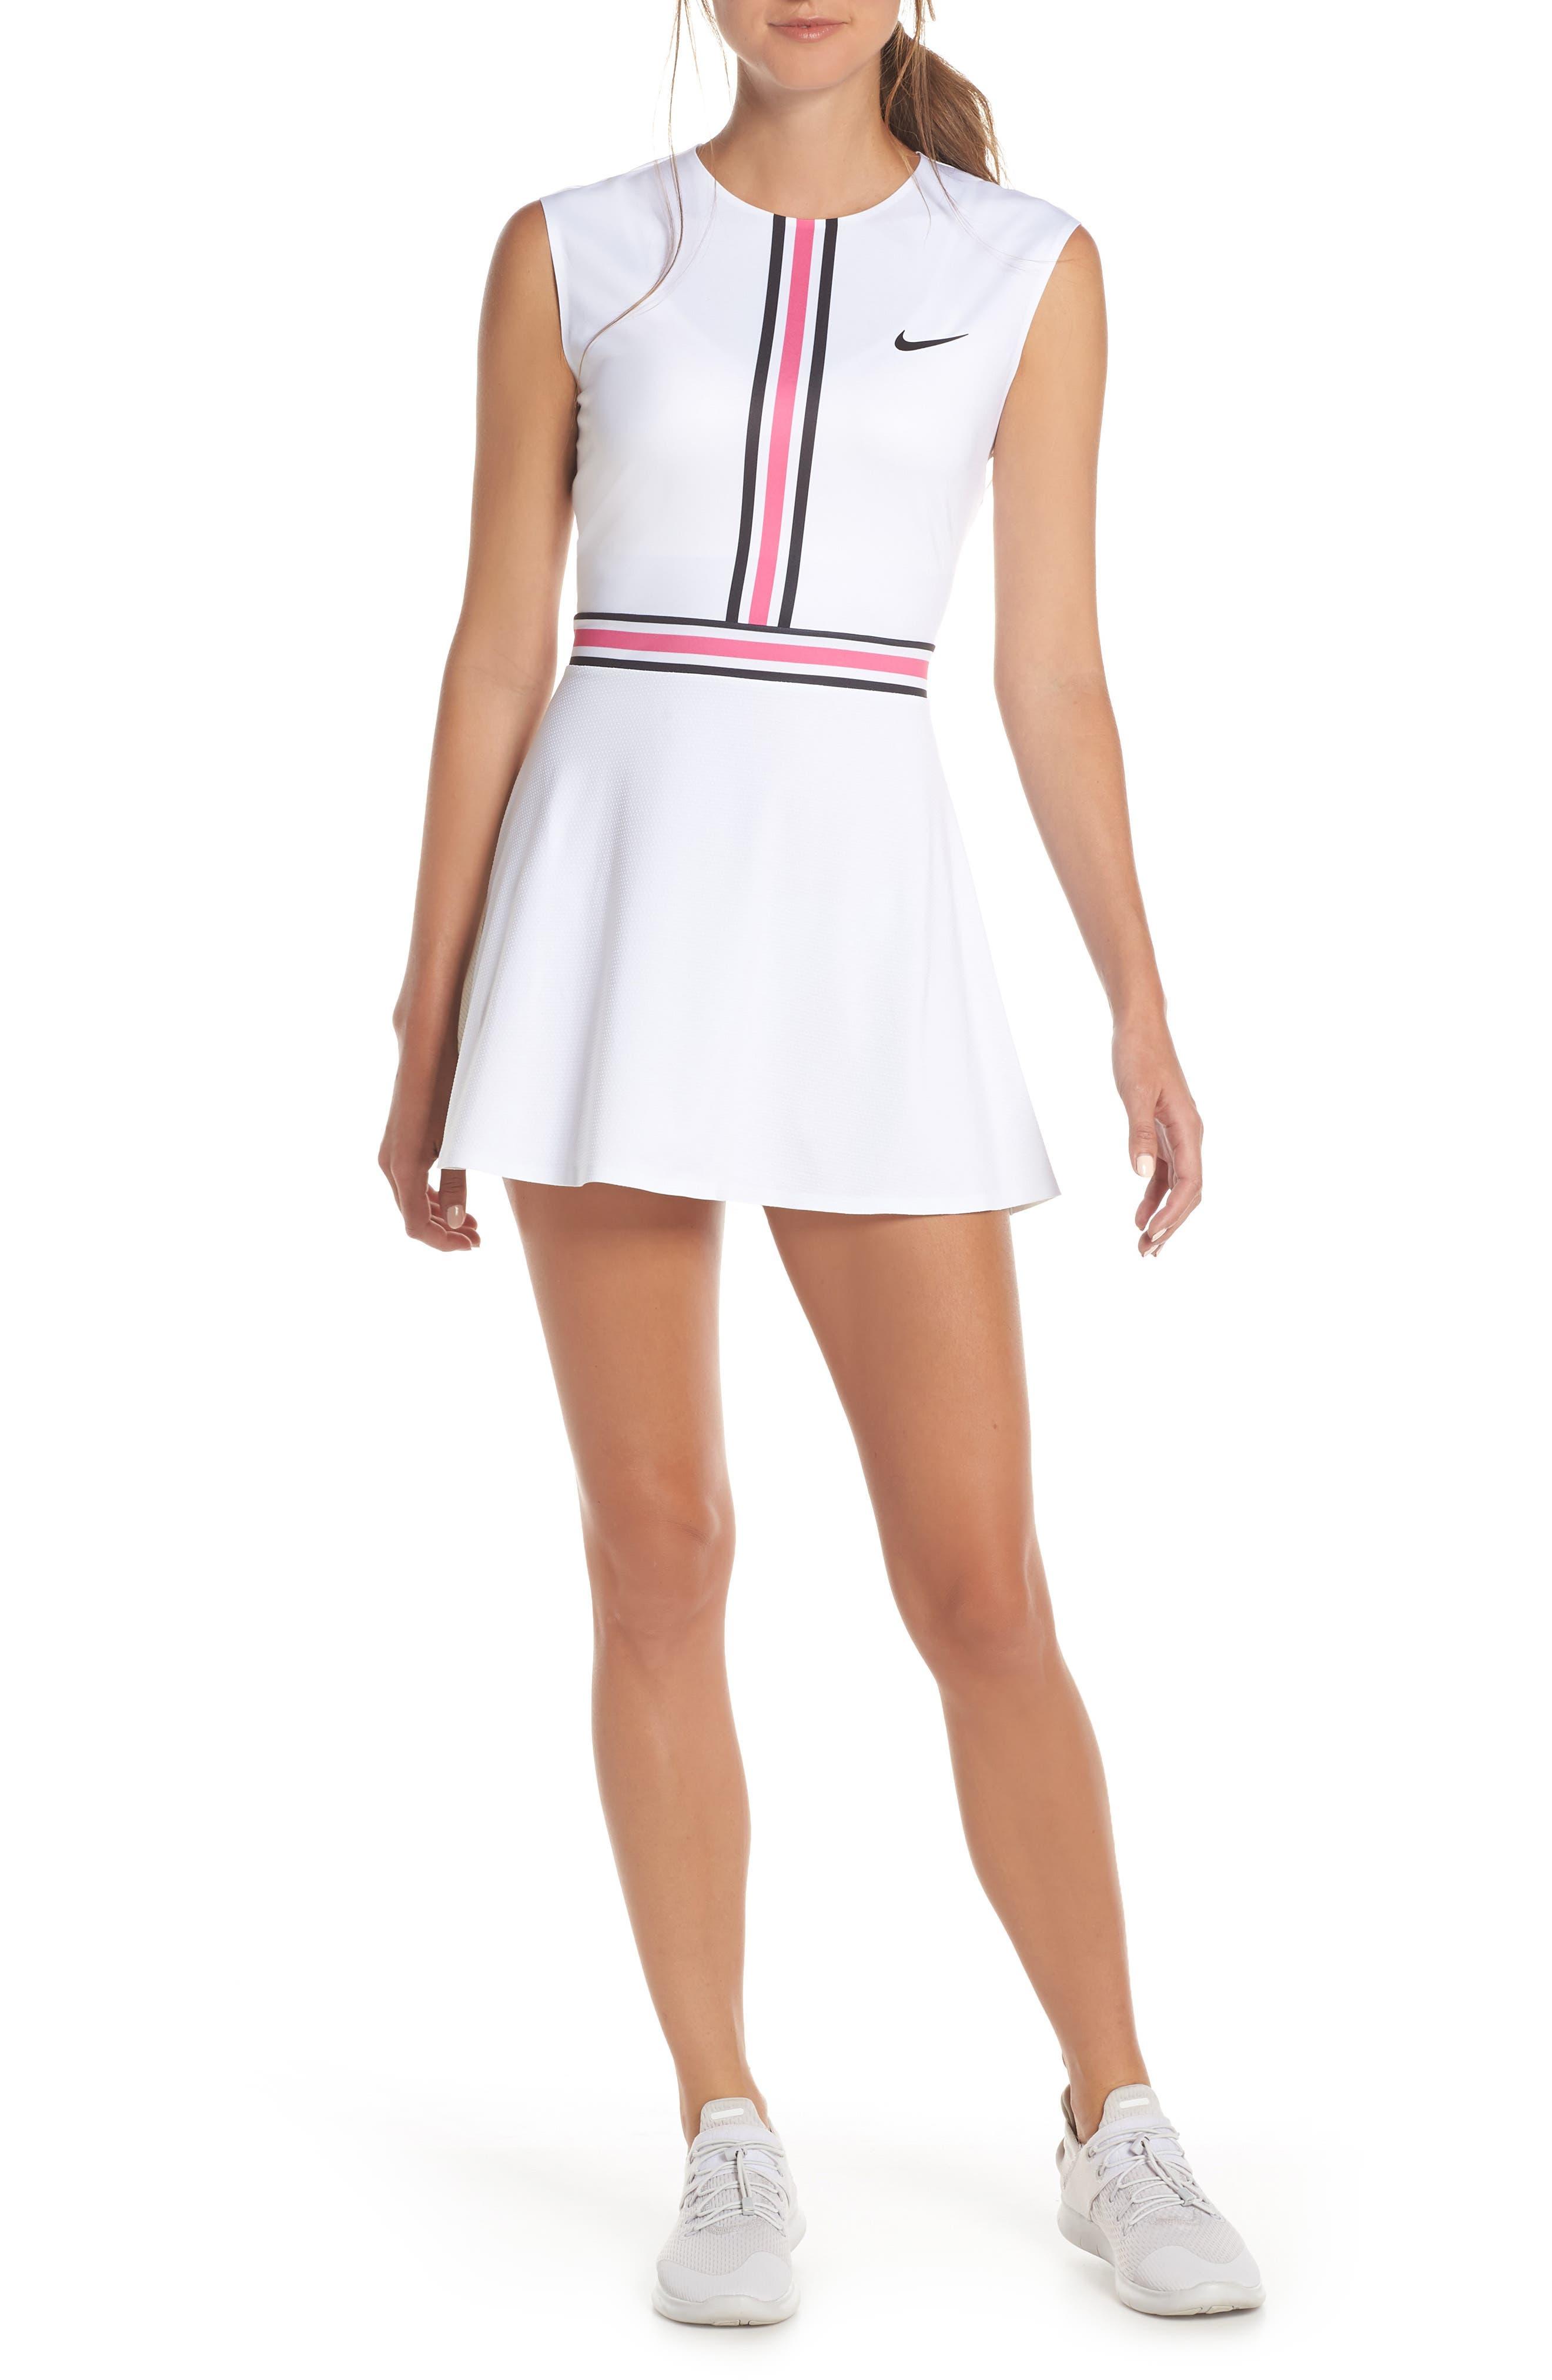 6a45e6e297cc tennis clothing